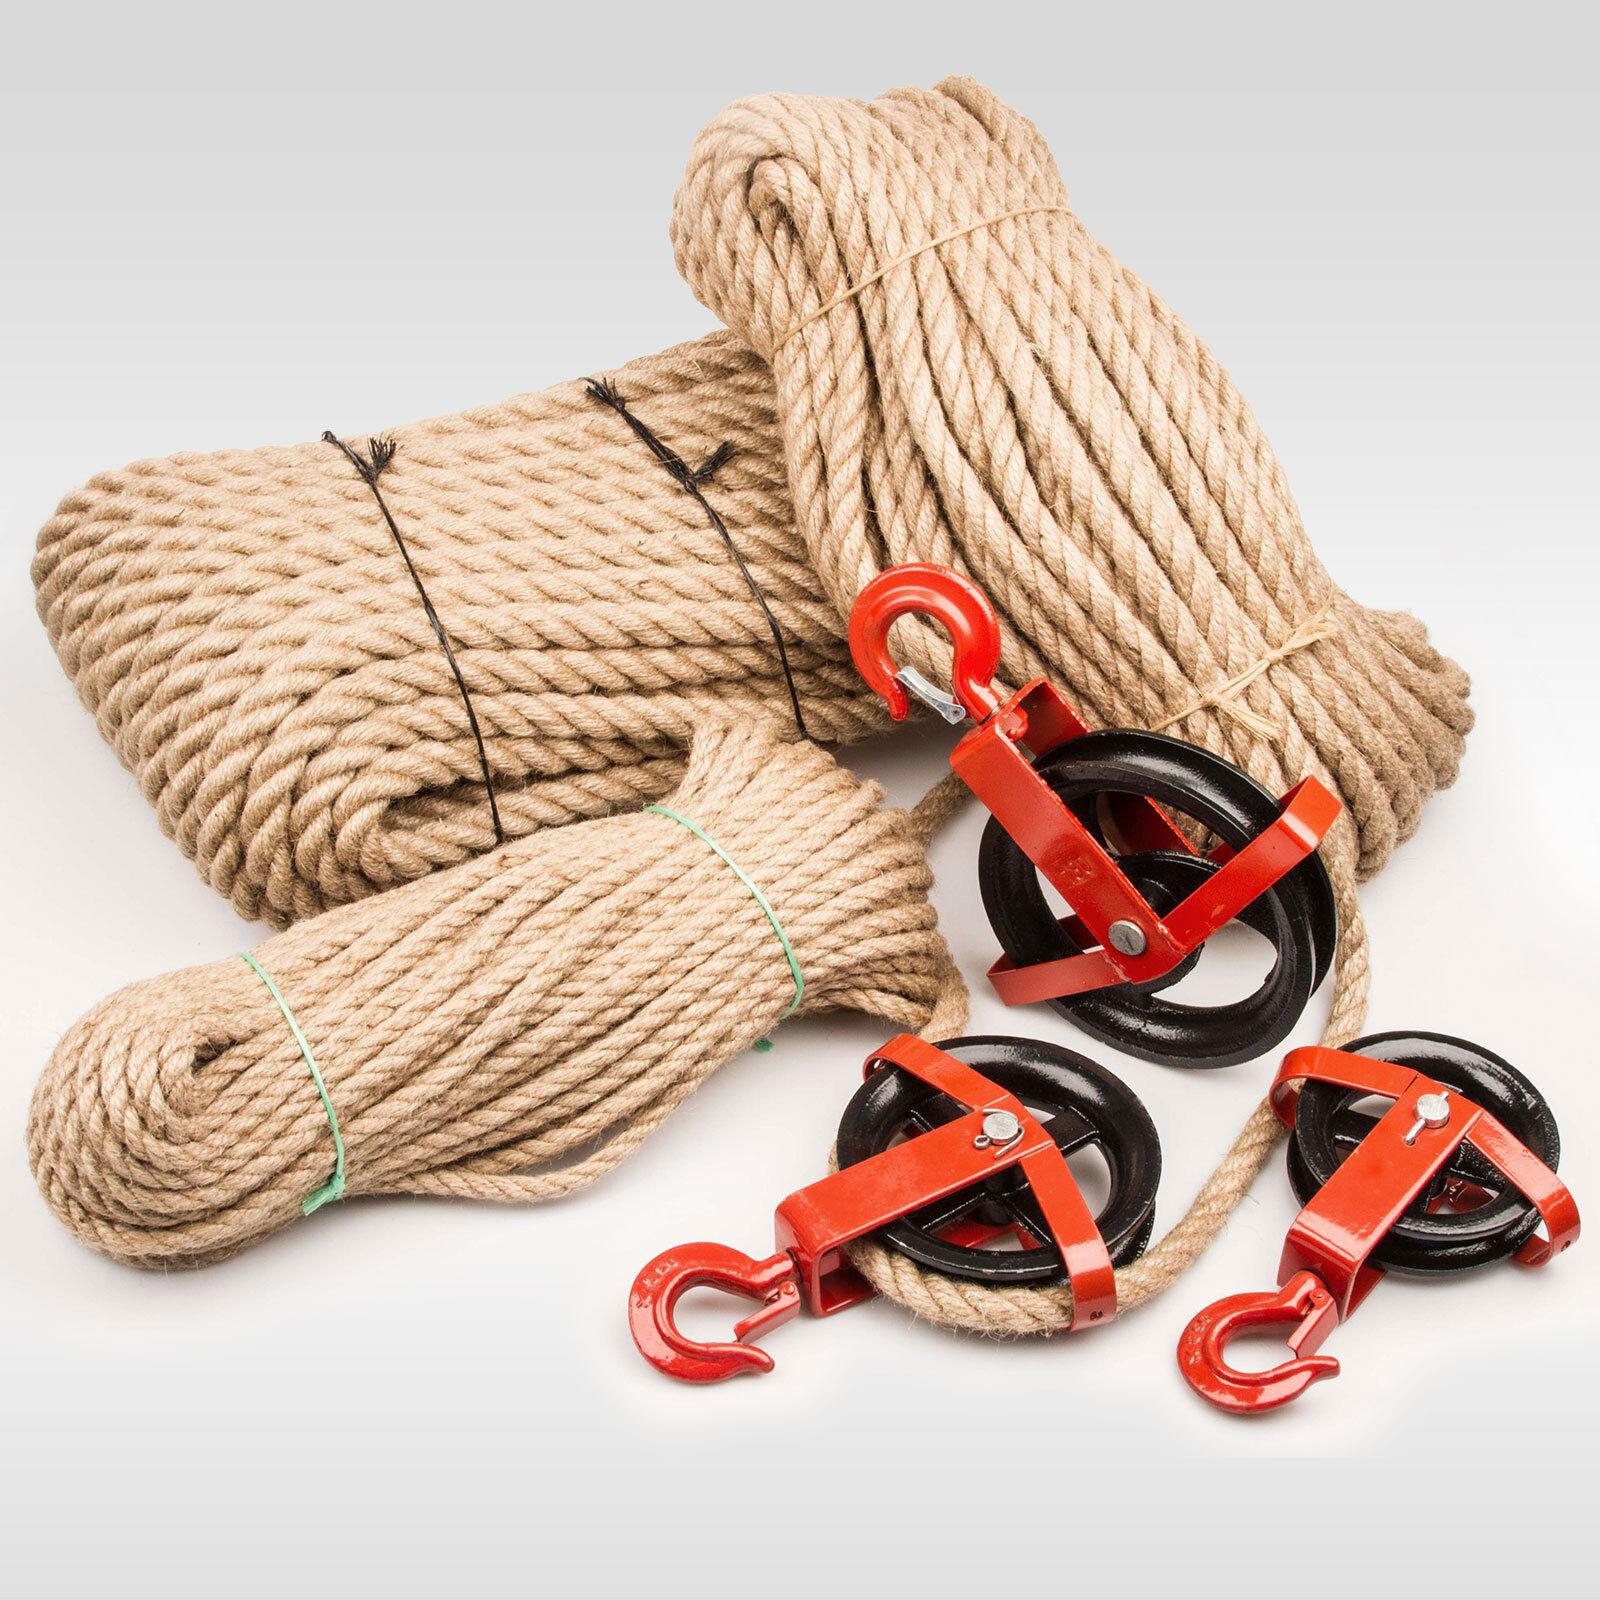 SET: 12mm JUTESEIL + UMLENKROLLE mit Haken Tauwerk Seilwinde Seilzug Seil